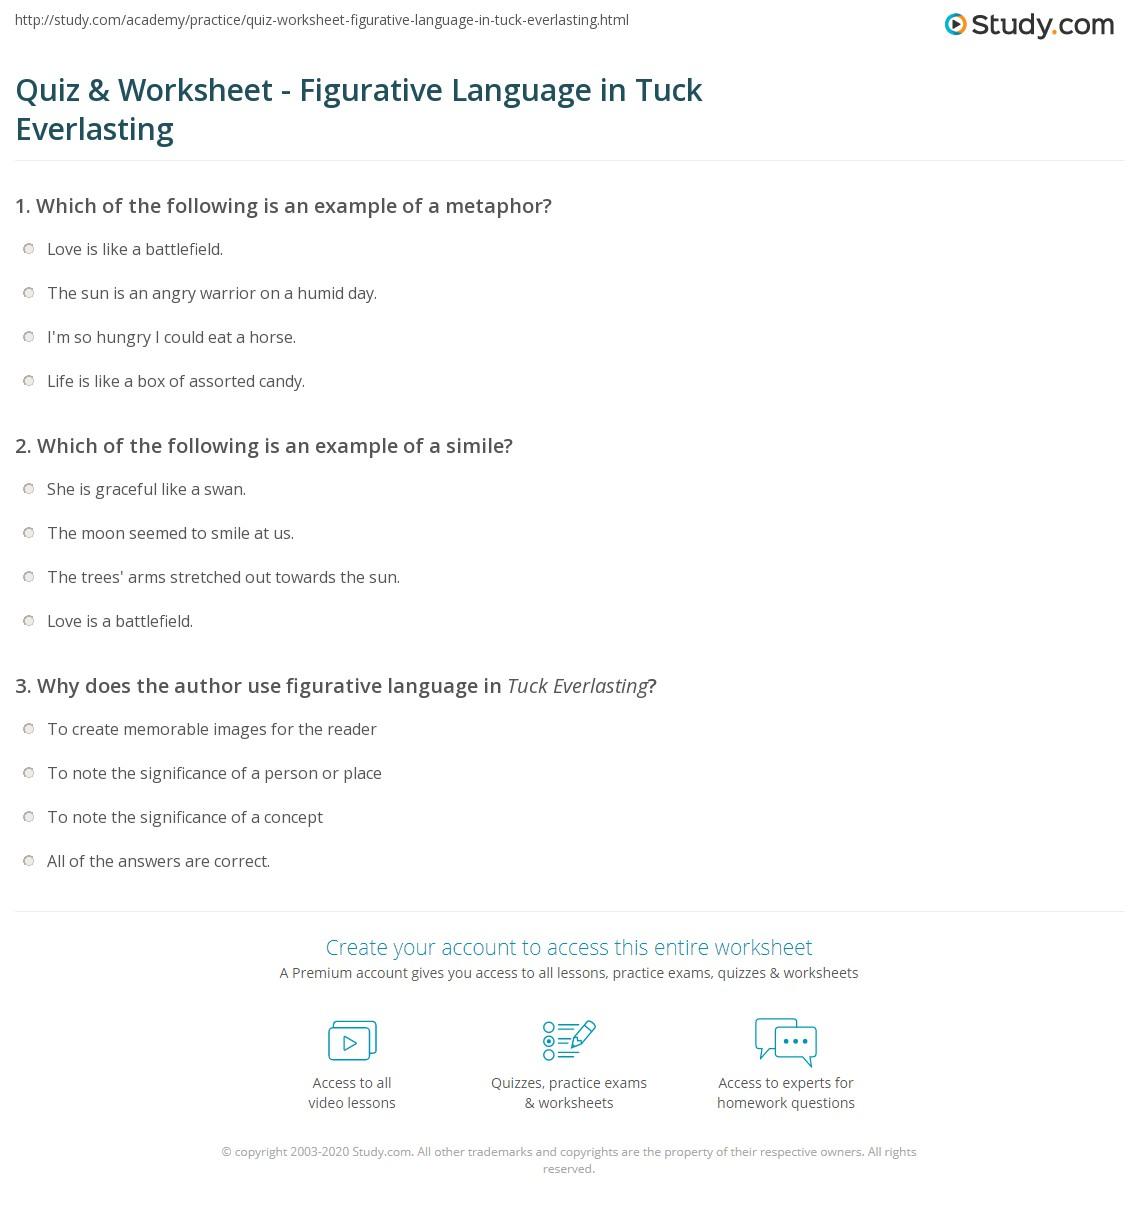 Worksheets Tuck Everlasting Worksheets quiz worksheet figurative language in tuck everlasting study com print metaphors worksheet